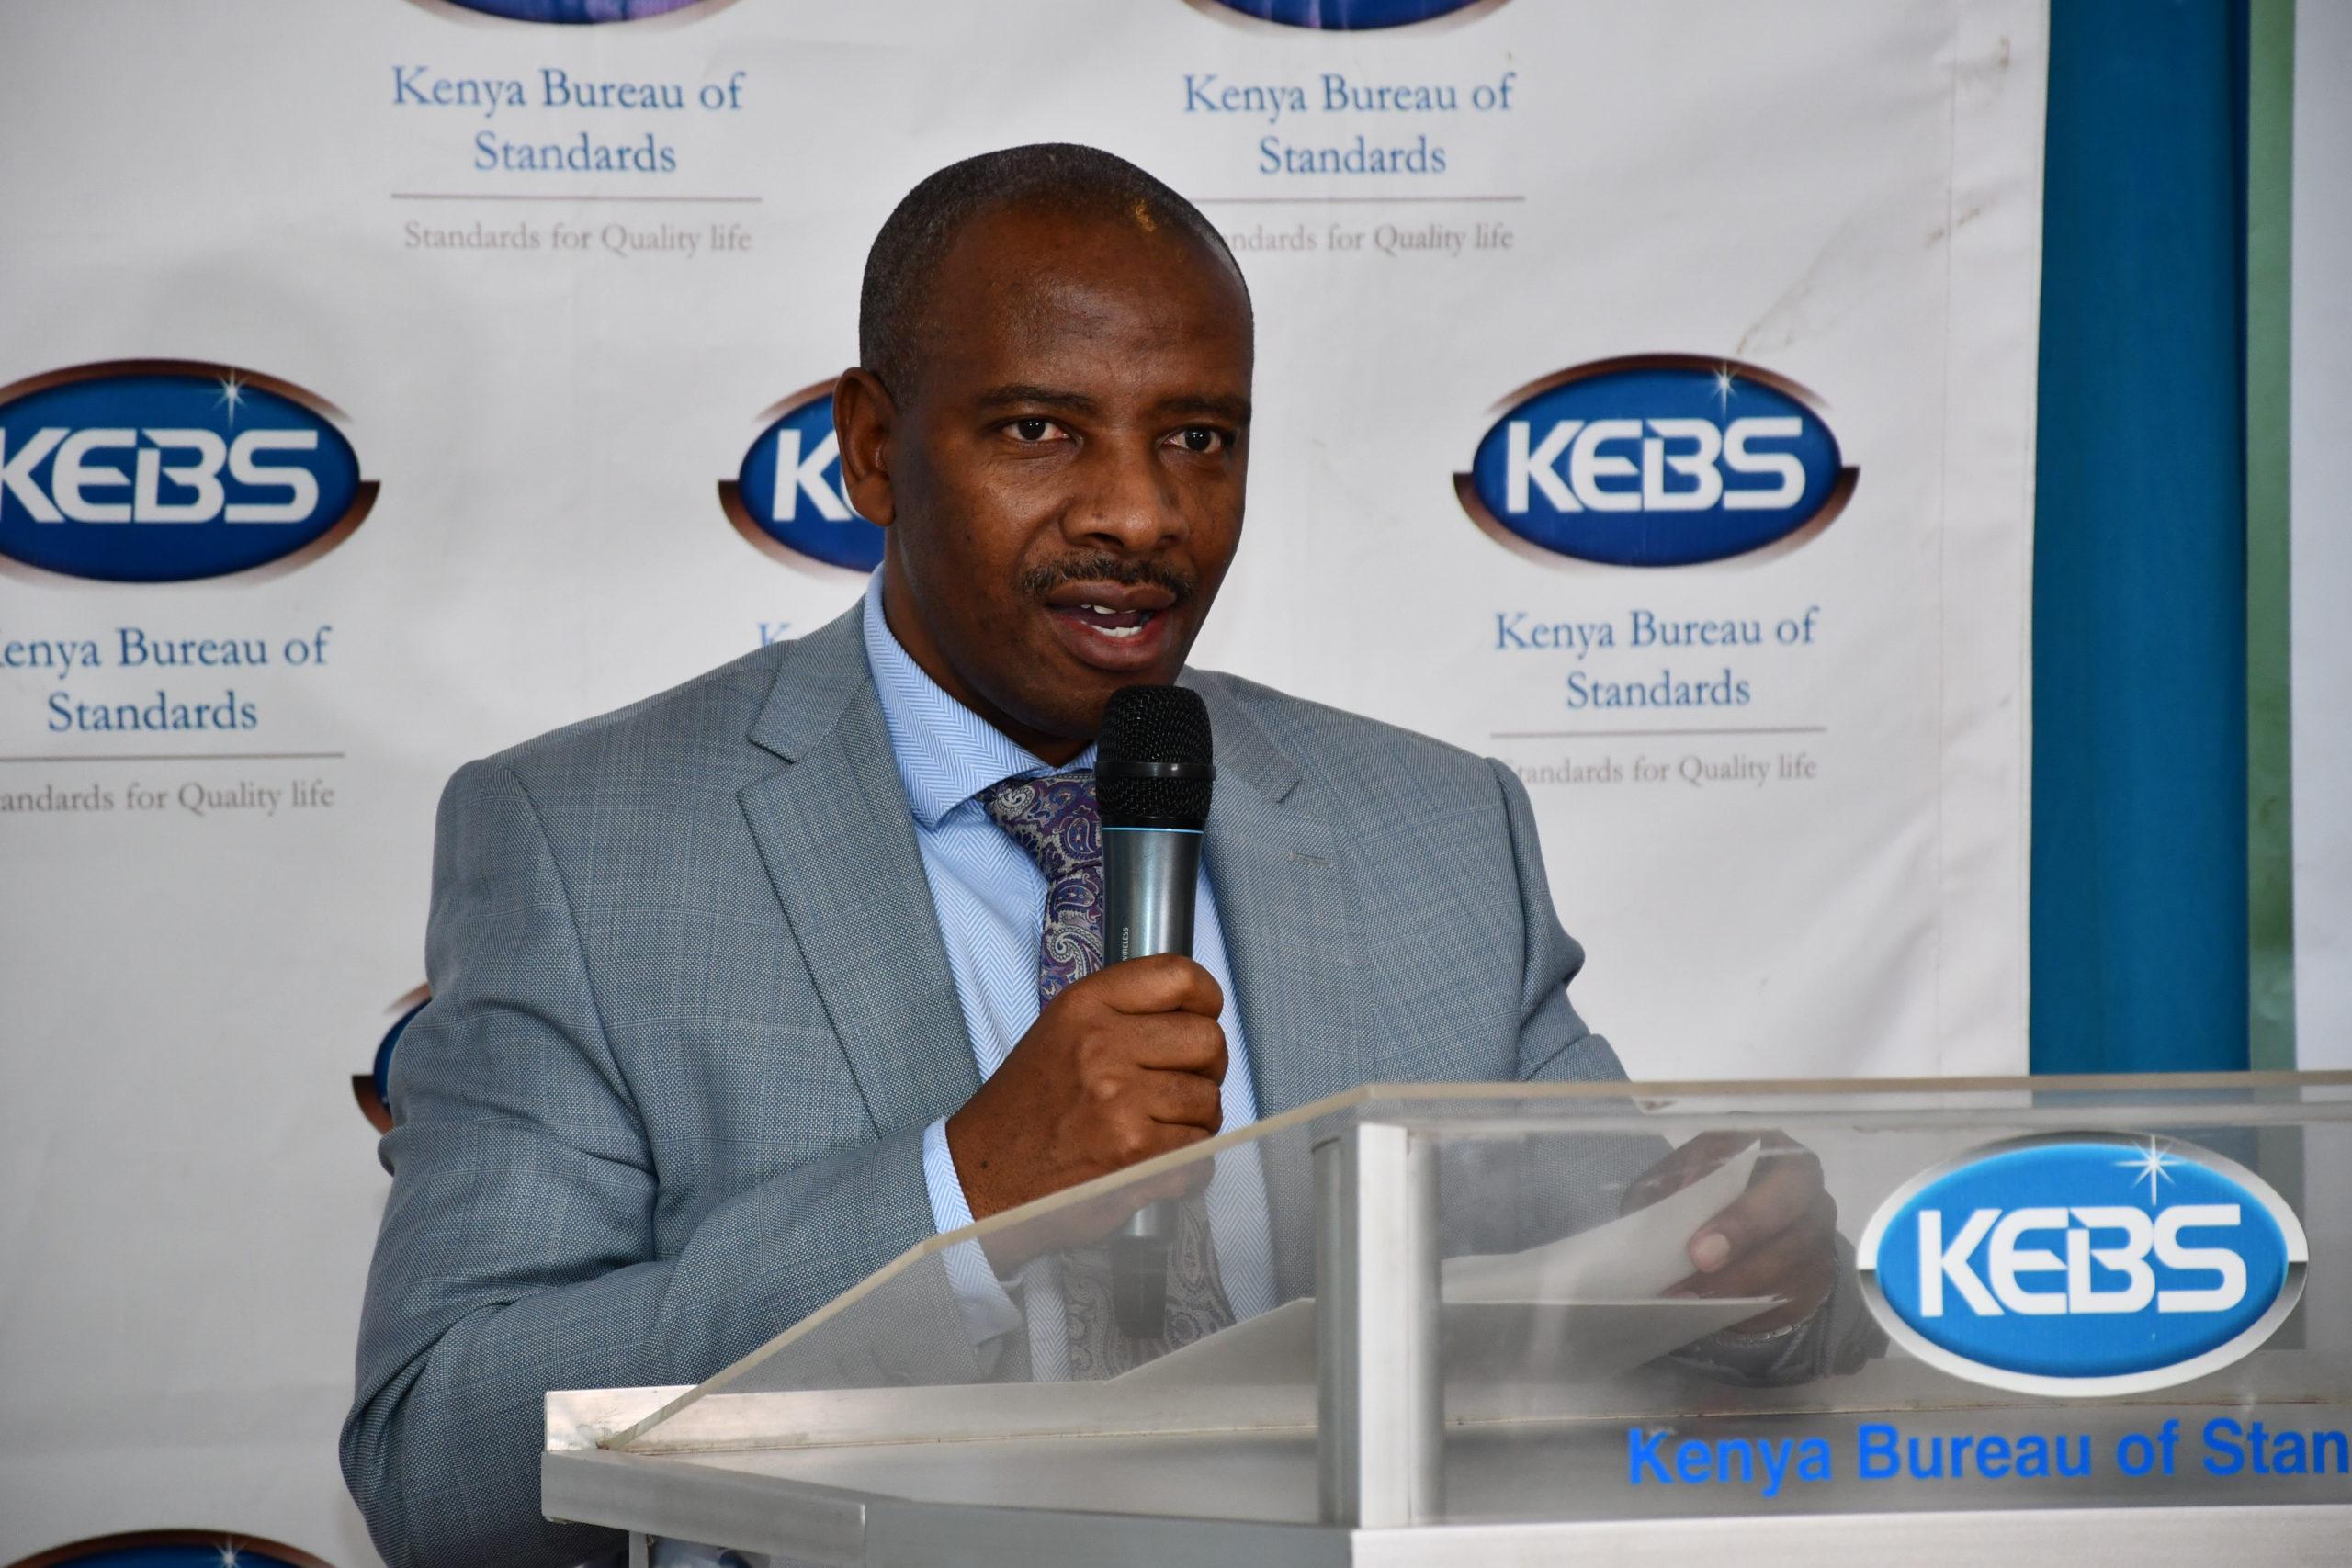 Recruitment Process at KEBS followed due Process-MD